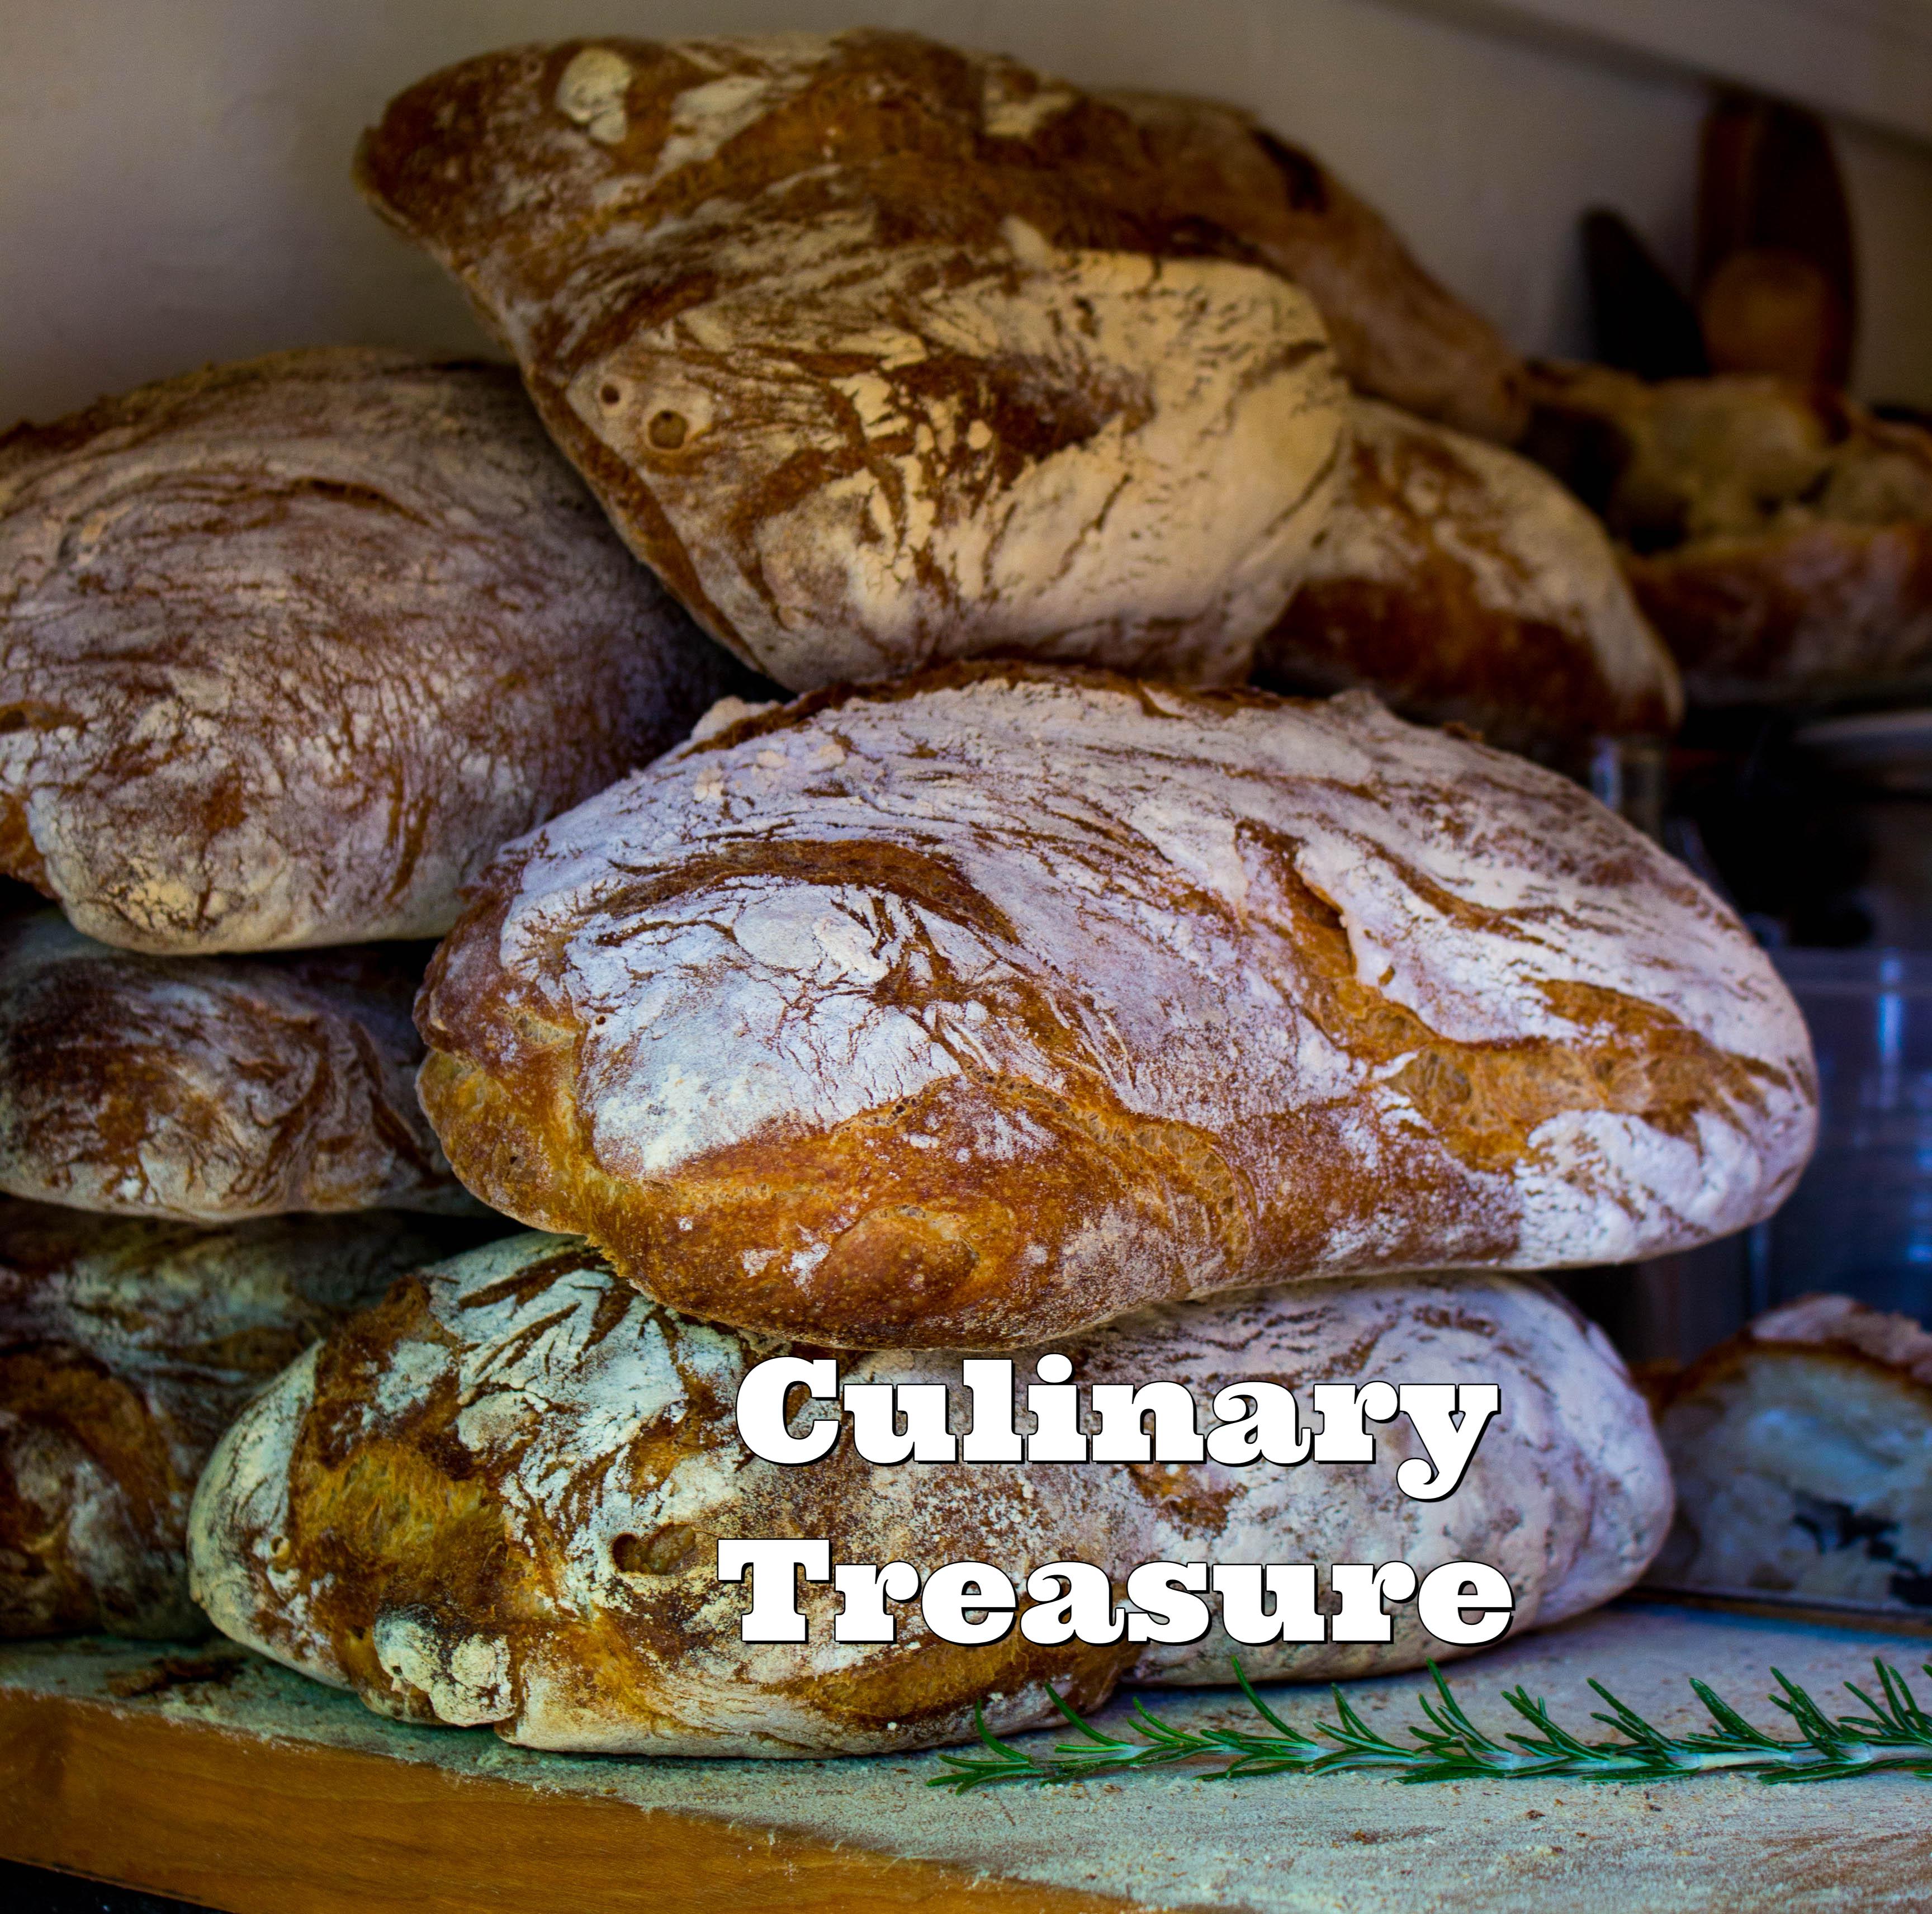 Culinary Treasure by Steven Shomler